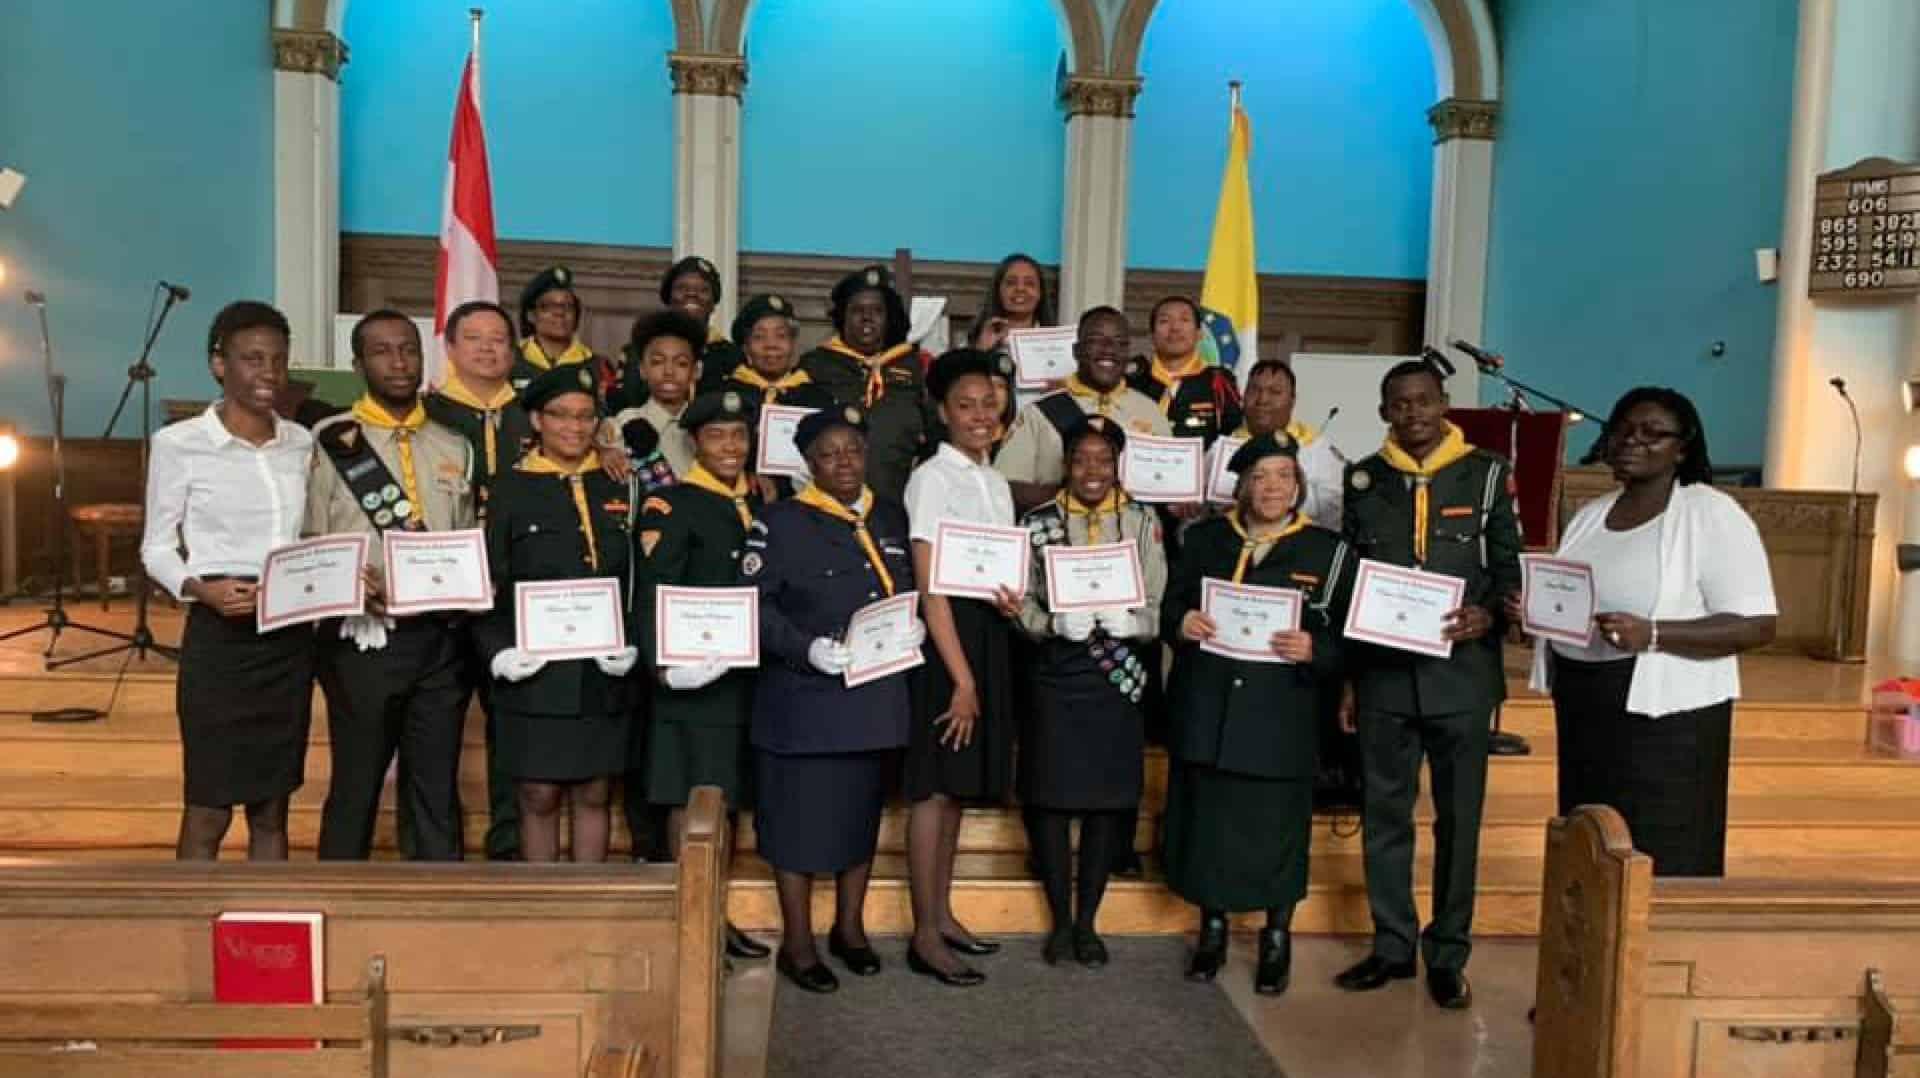 Ontario Master Guides